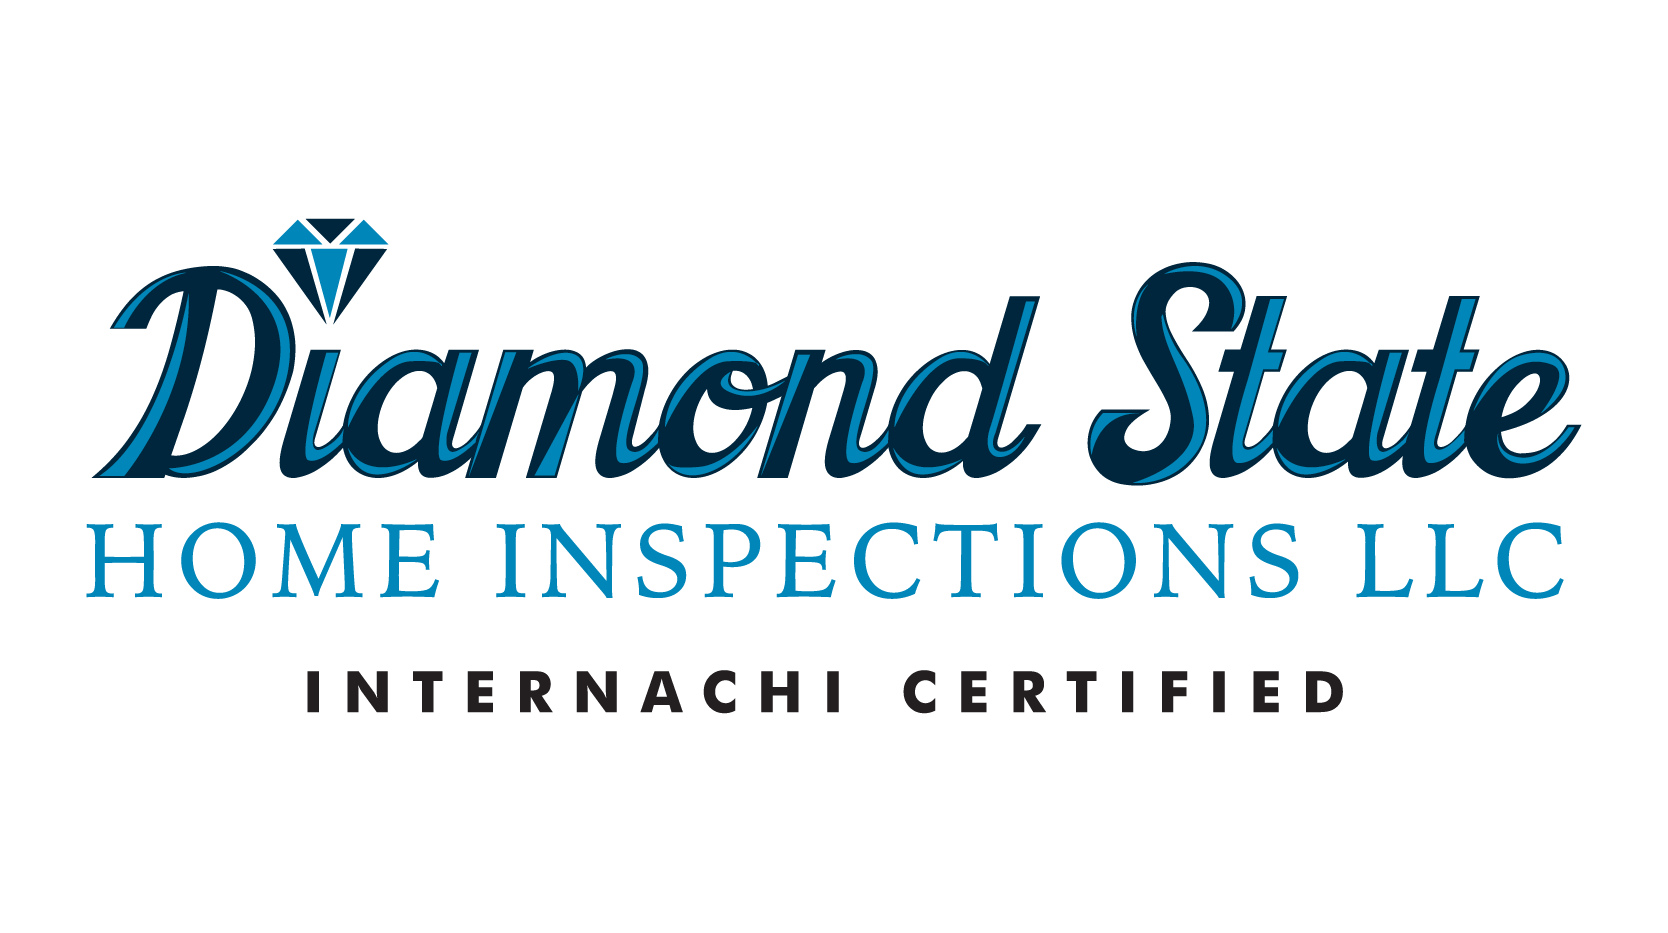 Diamond State Home Inspections LLC